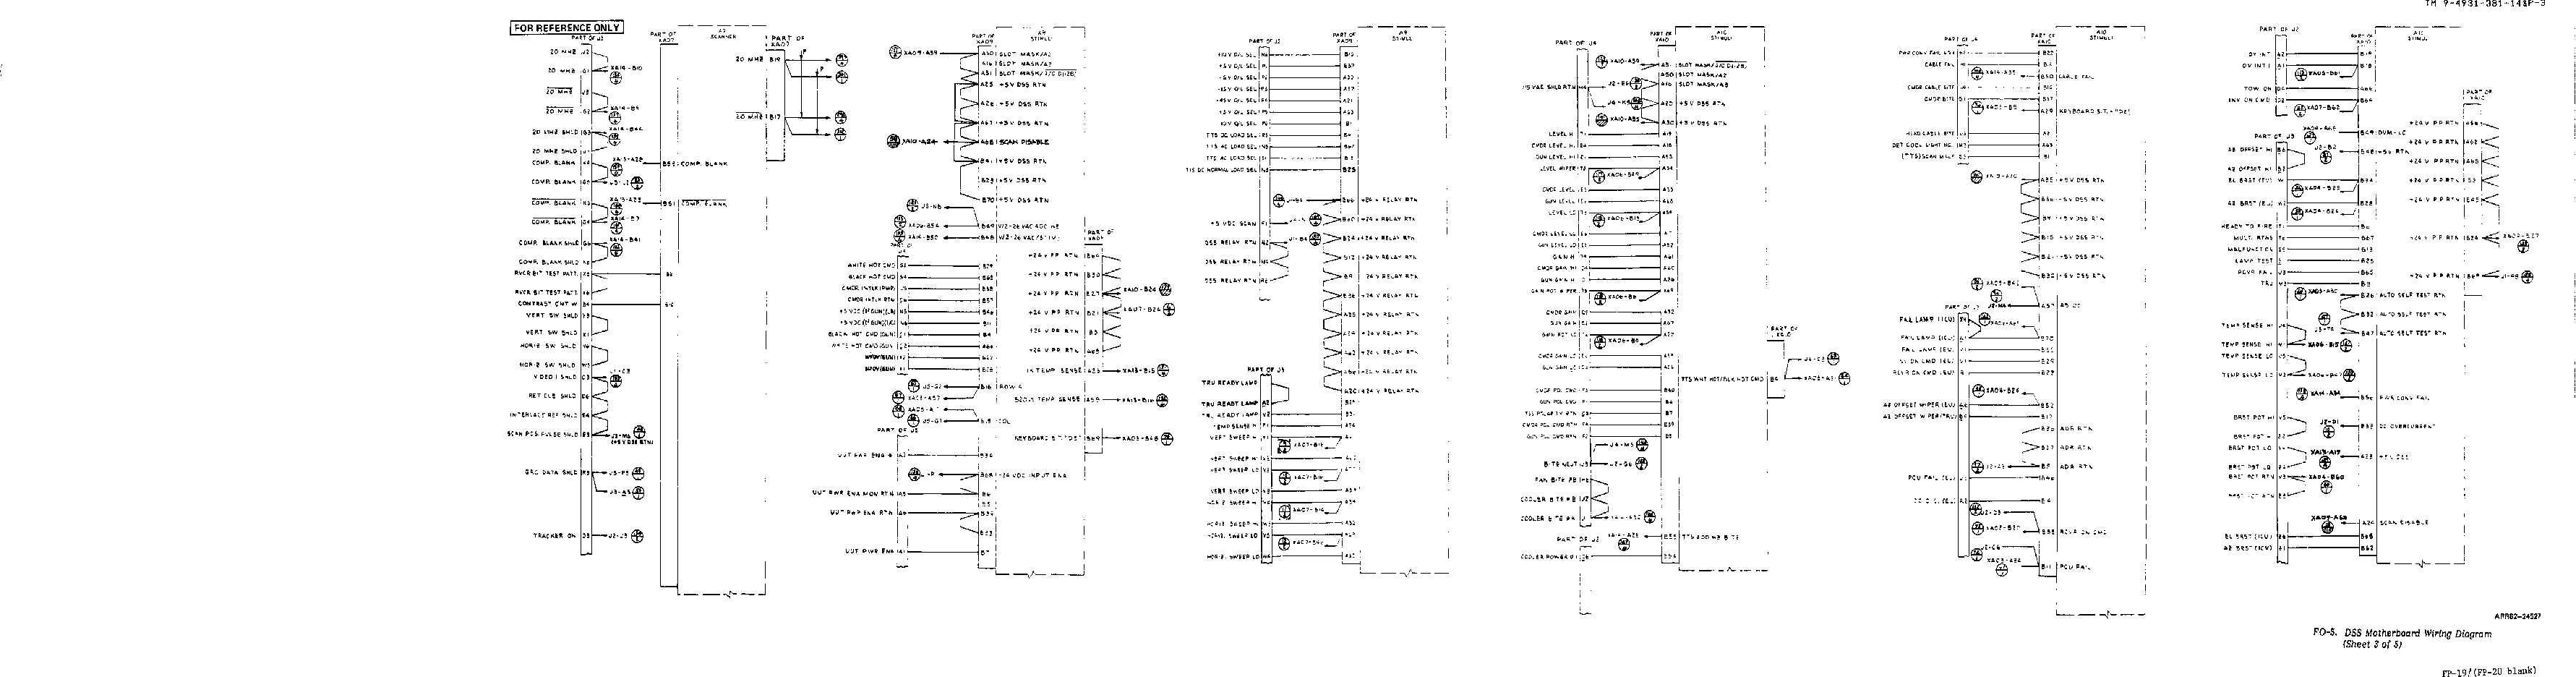 fo 5 dss motherboard wiring diagram sheet 3 of 5. Black Bedroom Furniture Sets. Home Design Ideas